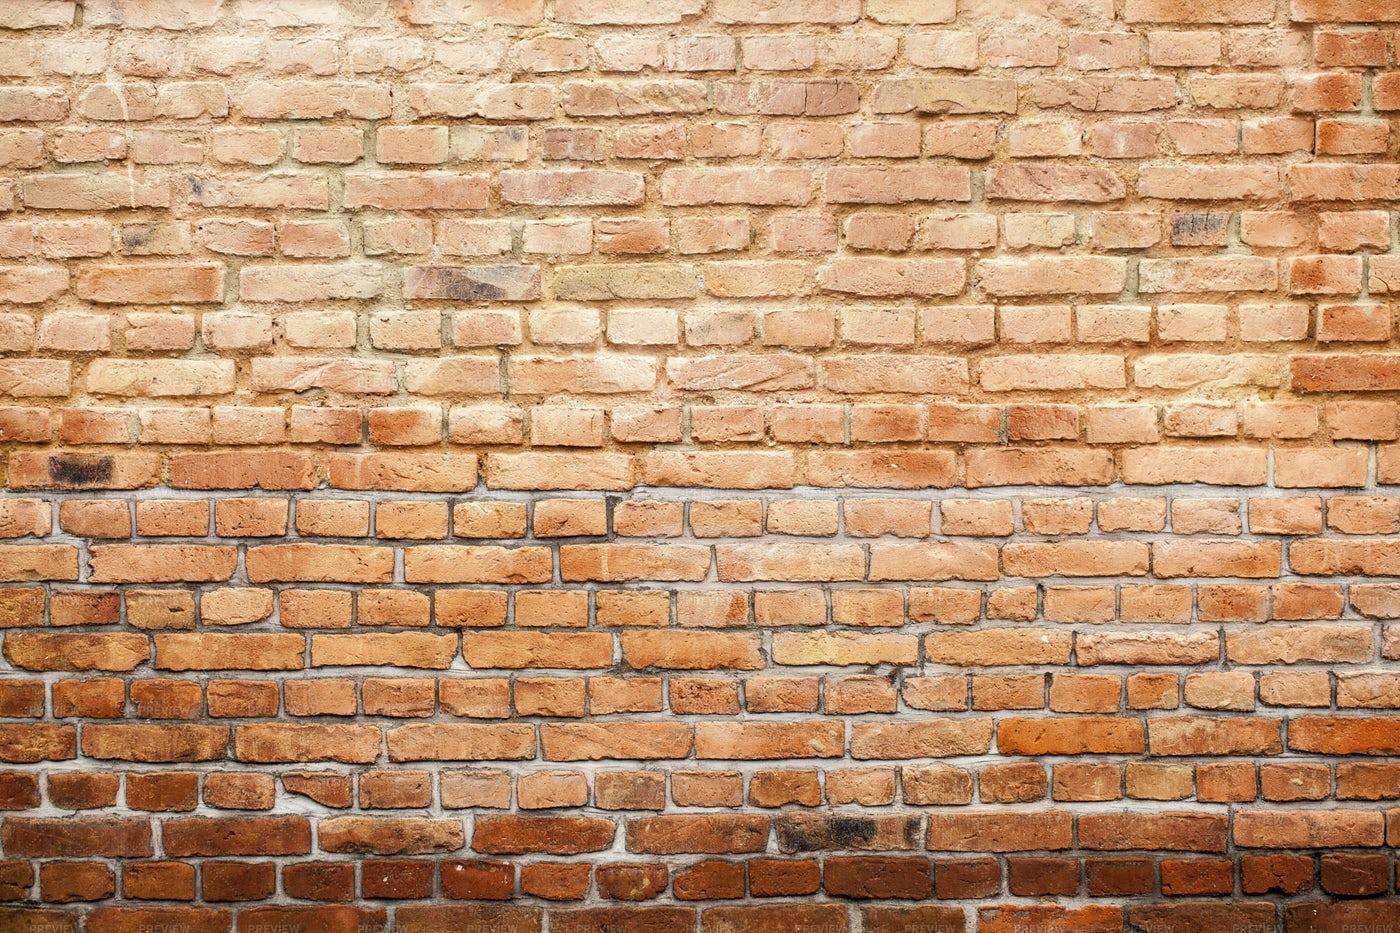 Brick Stone Wall Background: Stock Photos